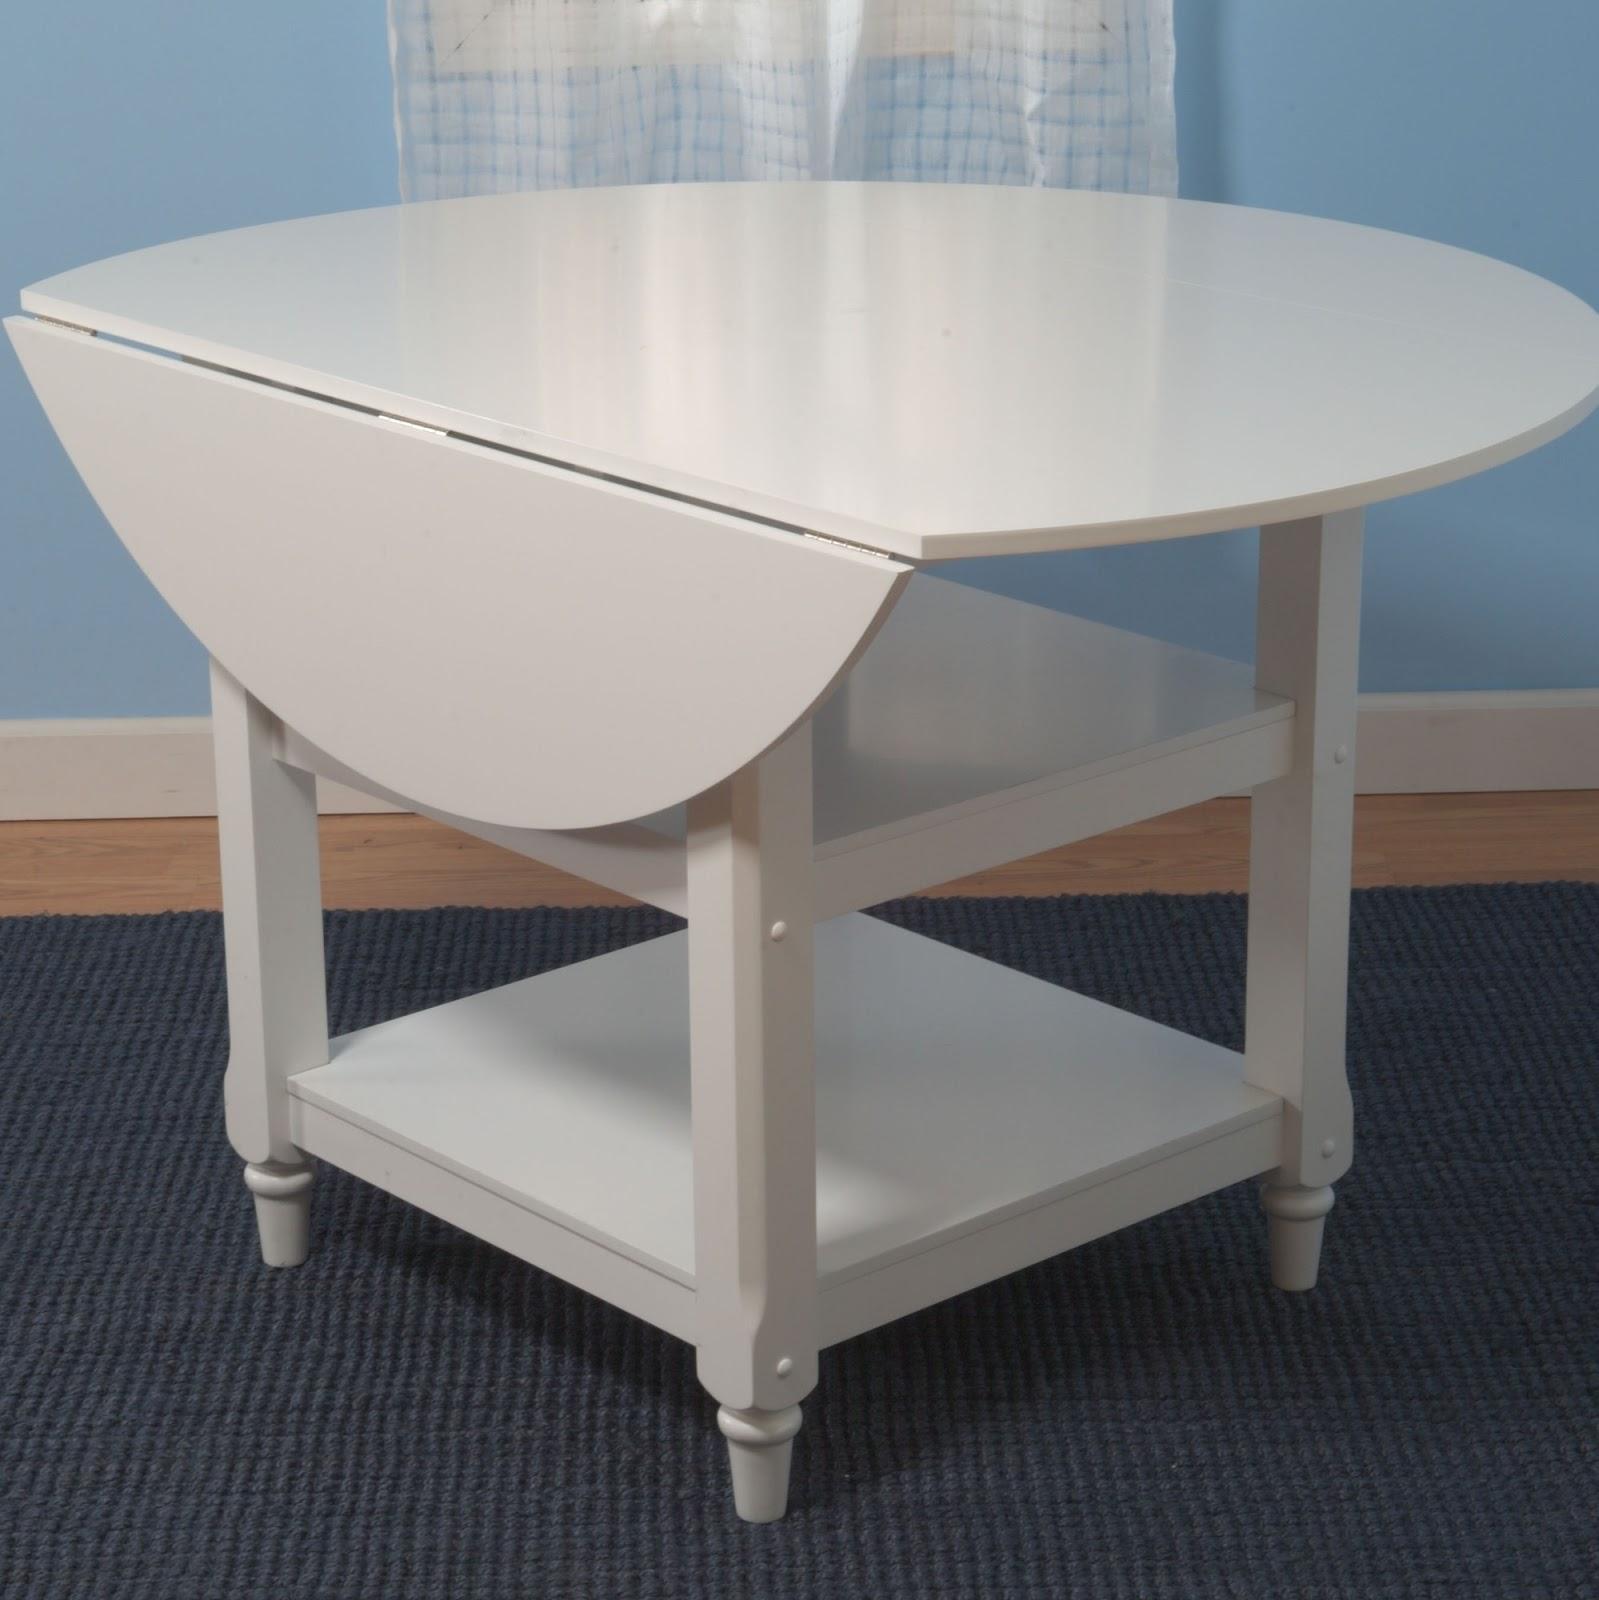 copy cat chic pottery barn shayne drop leaf kitchen table. Black Bedroom Furniture Sets. Home Design Ideas